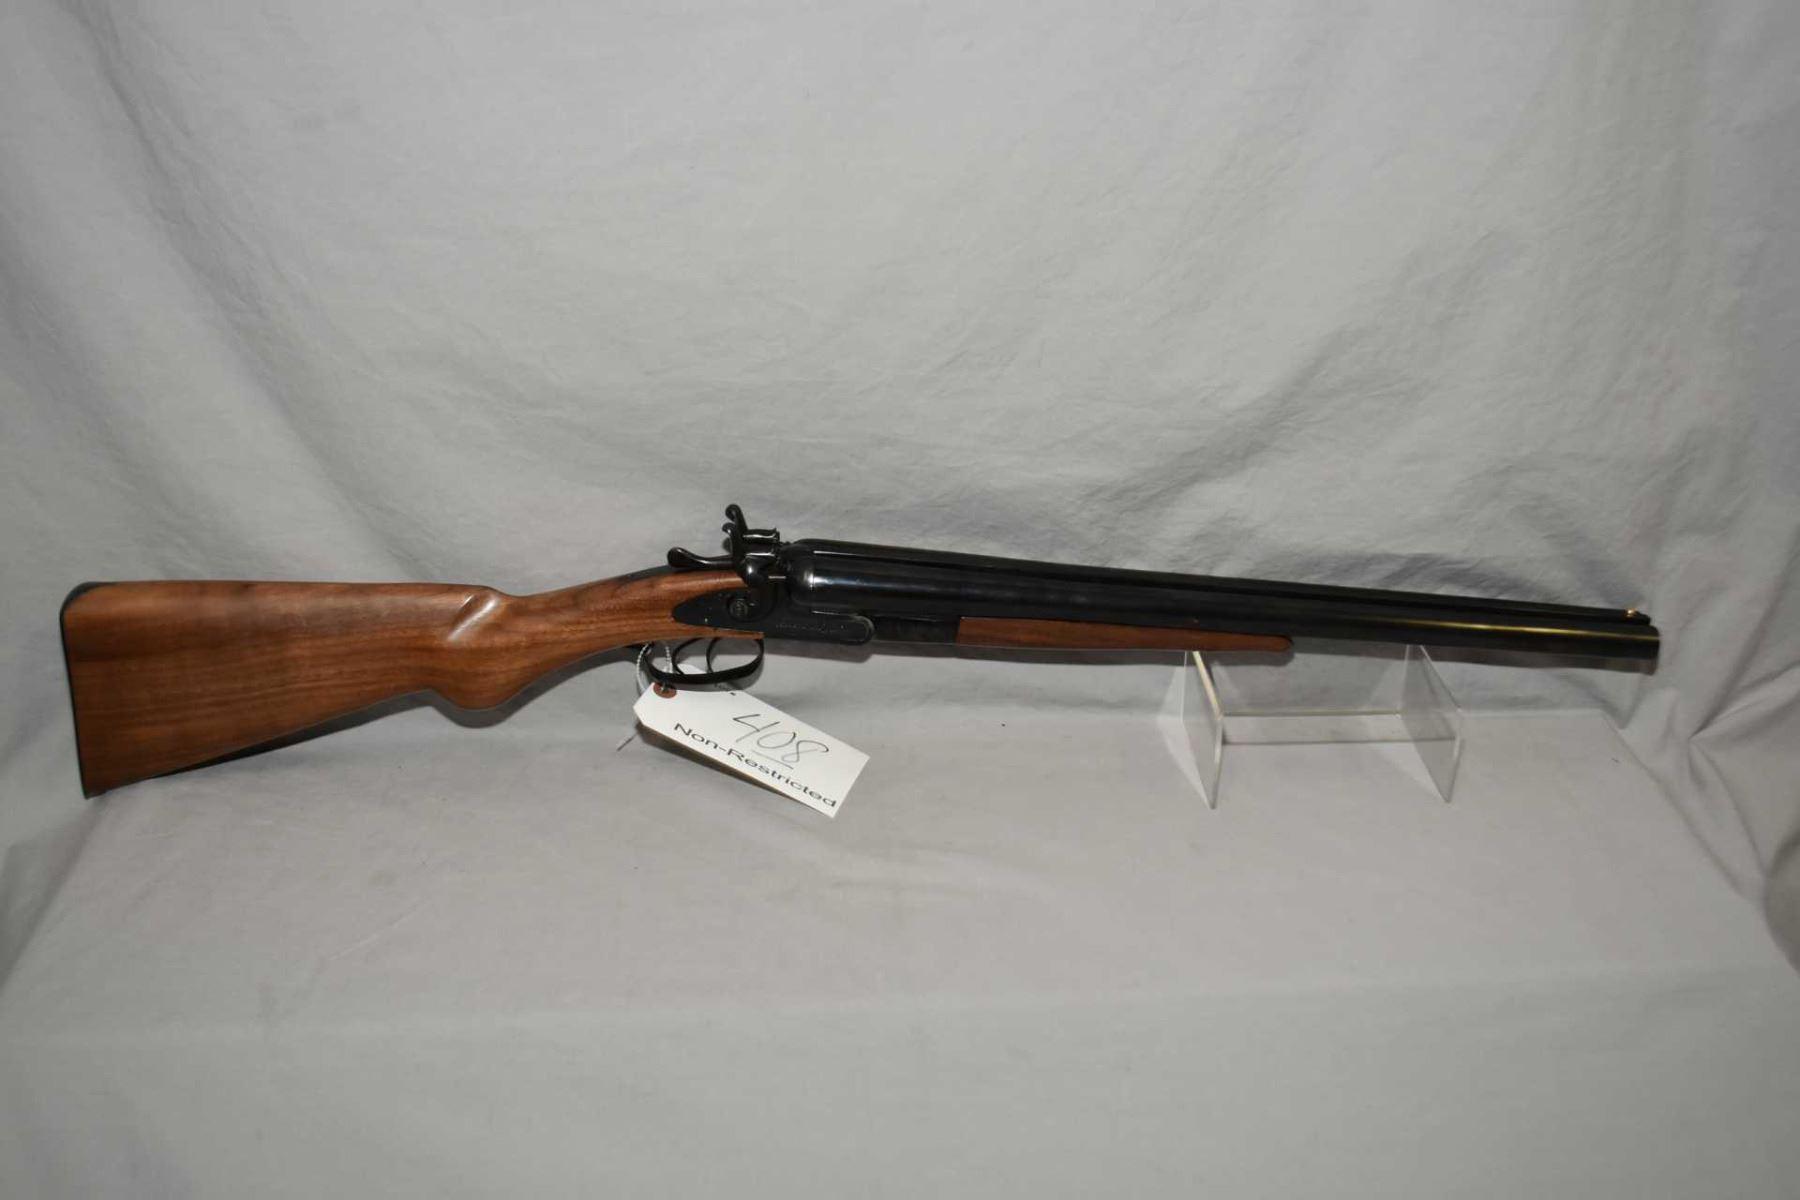 Cimarron Arms Mfg Co  Model 1878 - LJC TRC  12 Ga 3